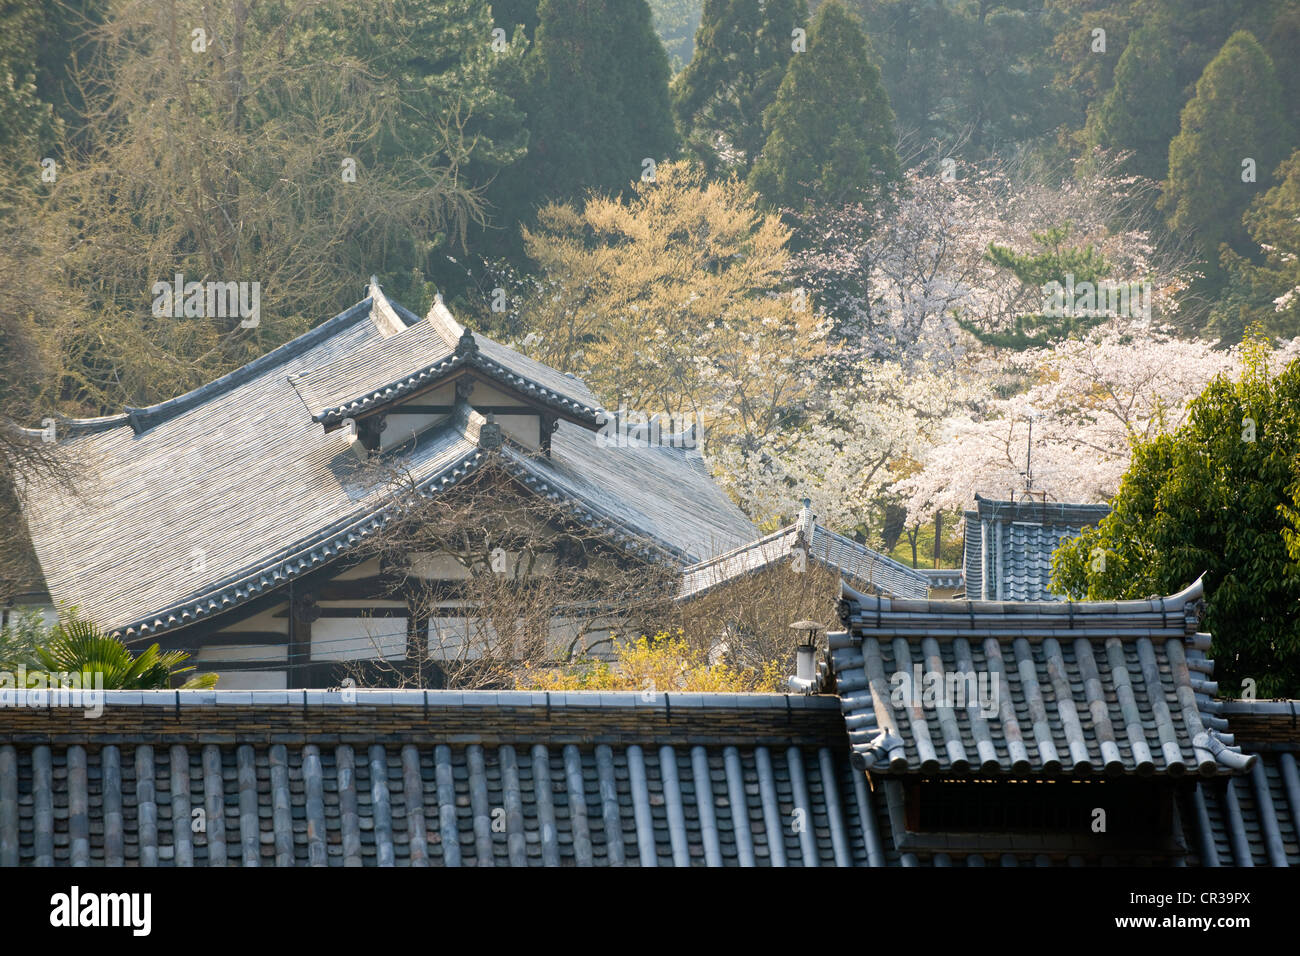 Japan, Honshu Island, Kinki Region, city of Nara, Historic Monuments of Ancient Nara UNESCO World Heritage, view Stock Photo